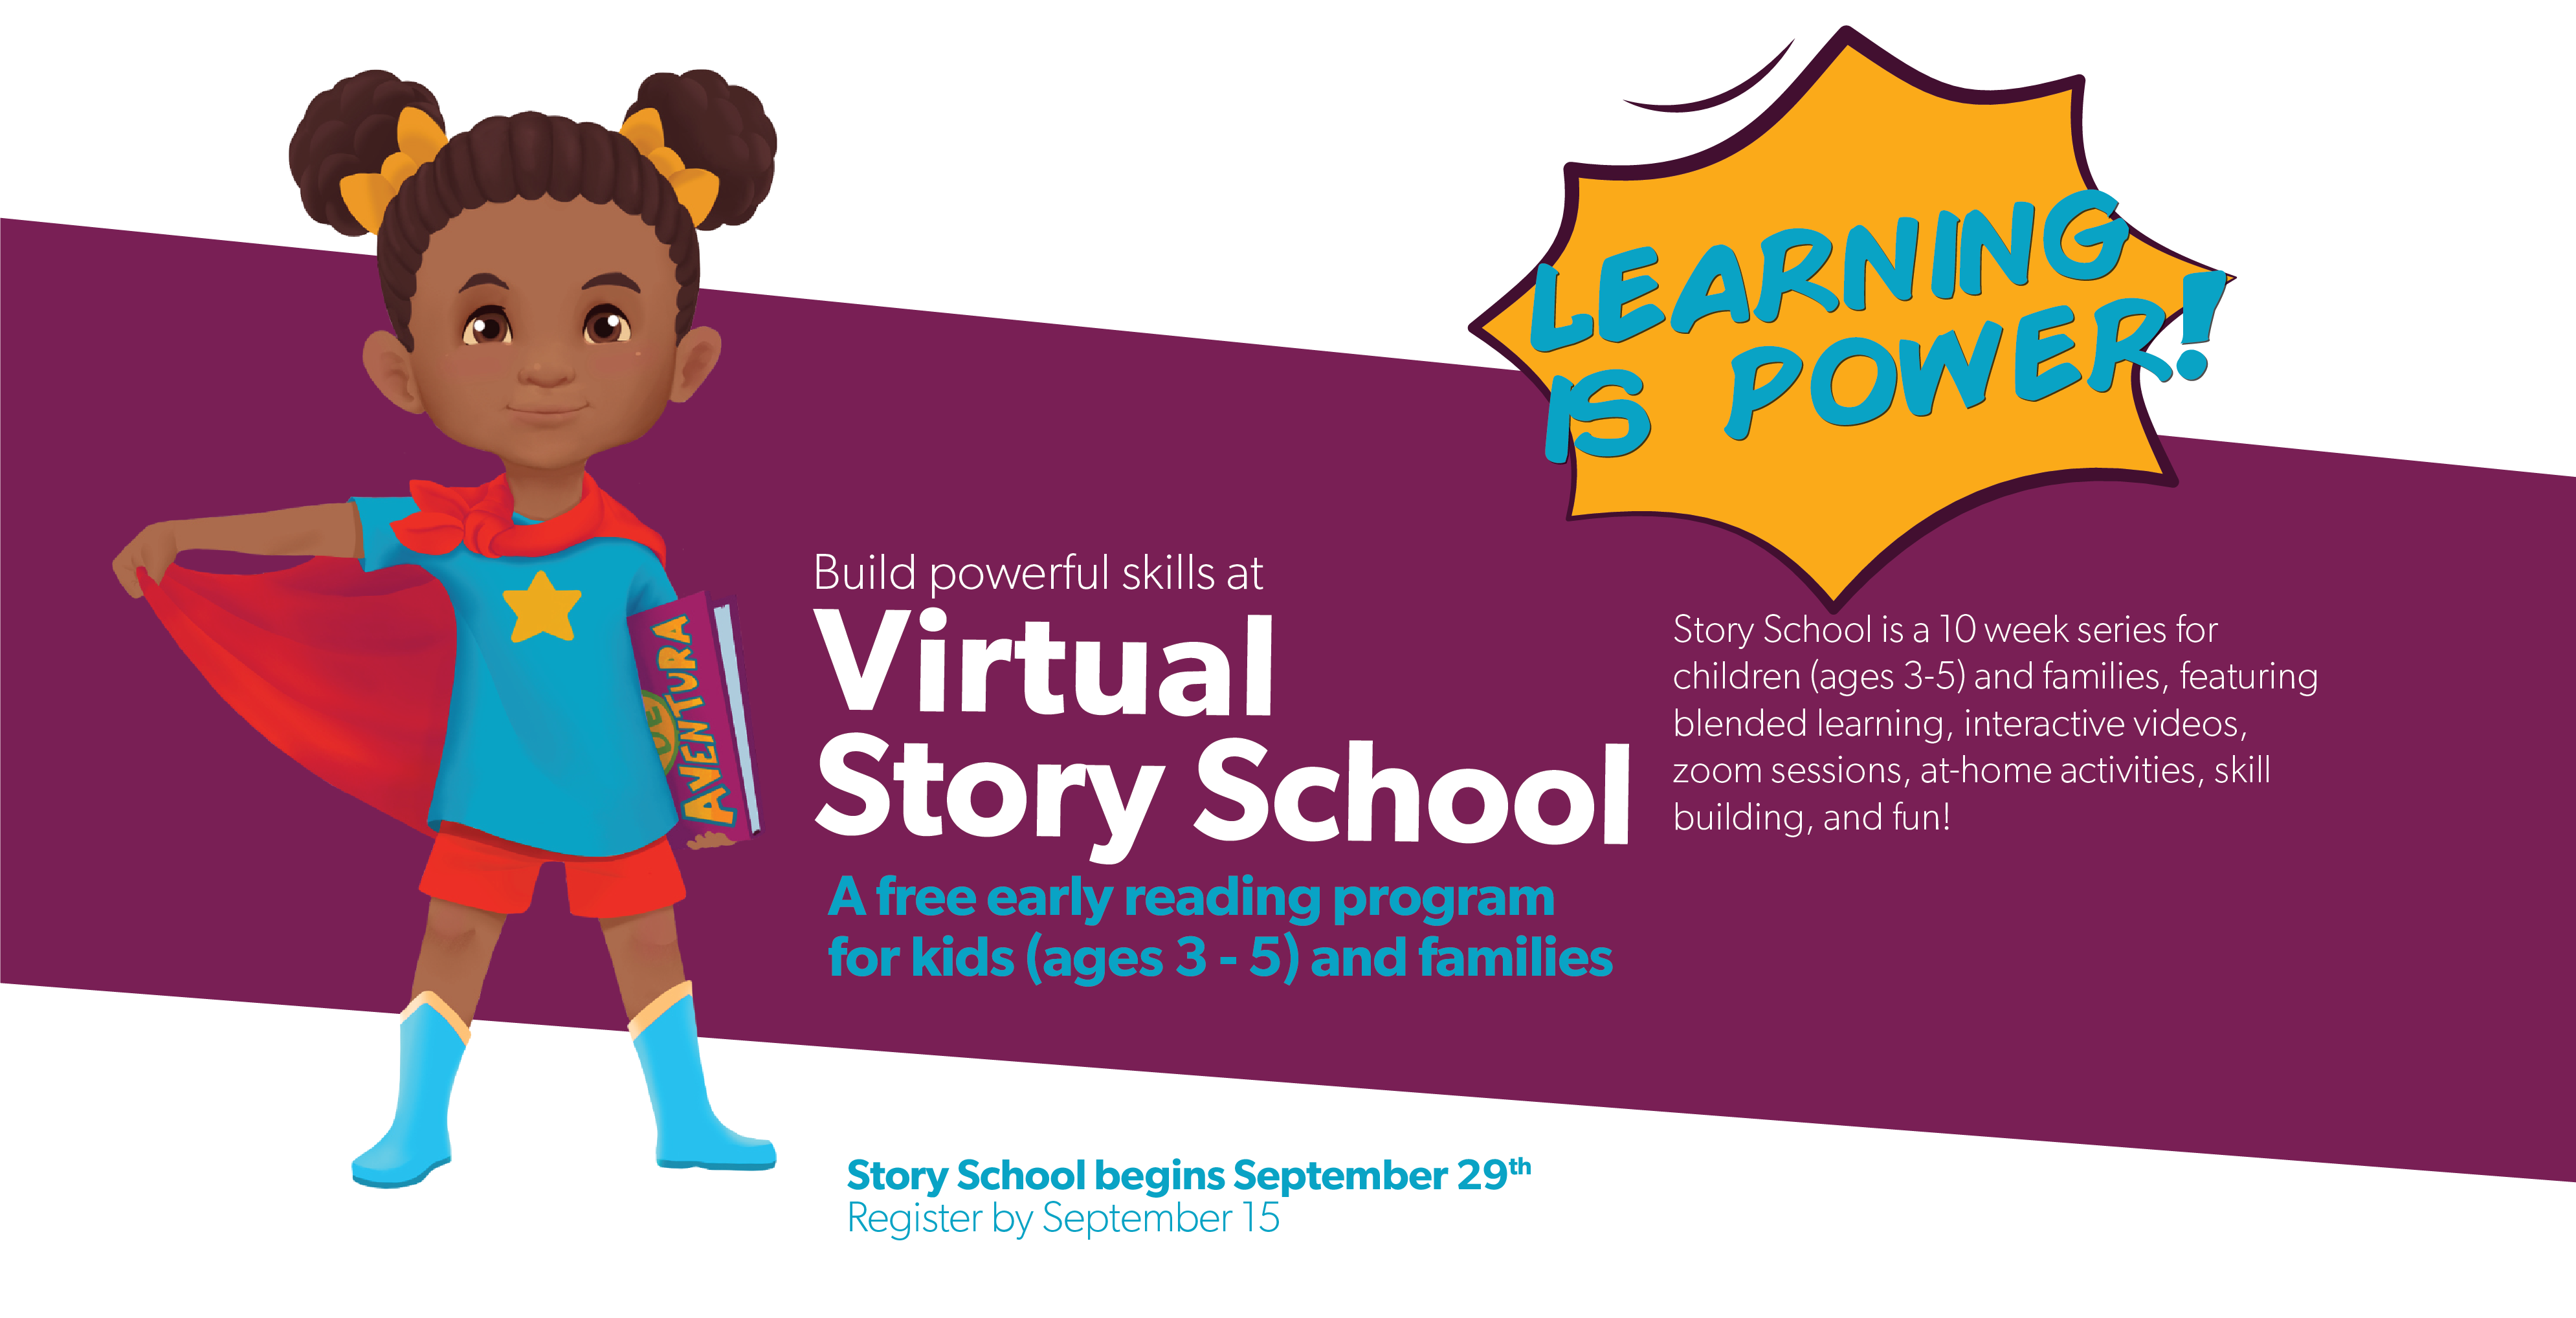 Virtual Story School